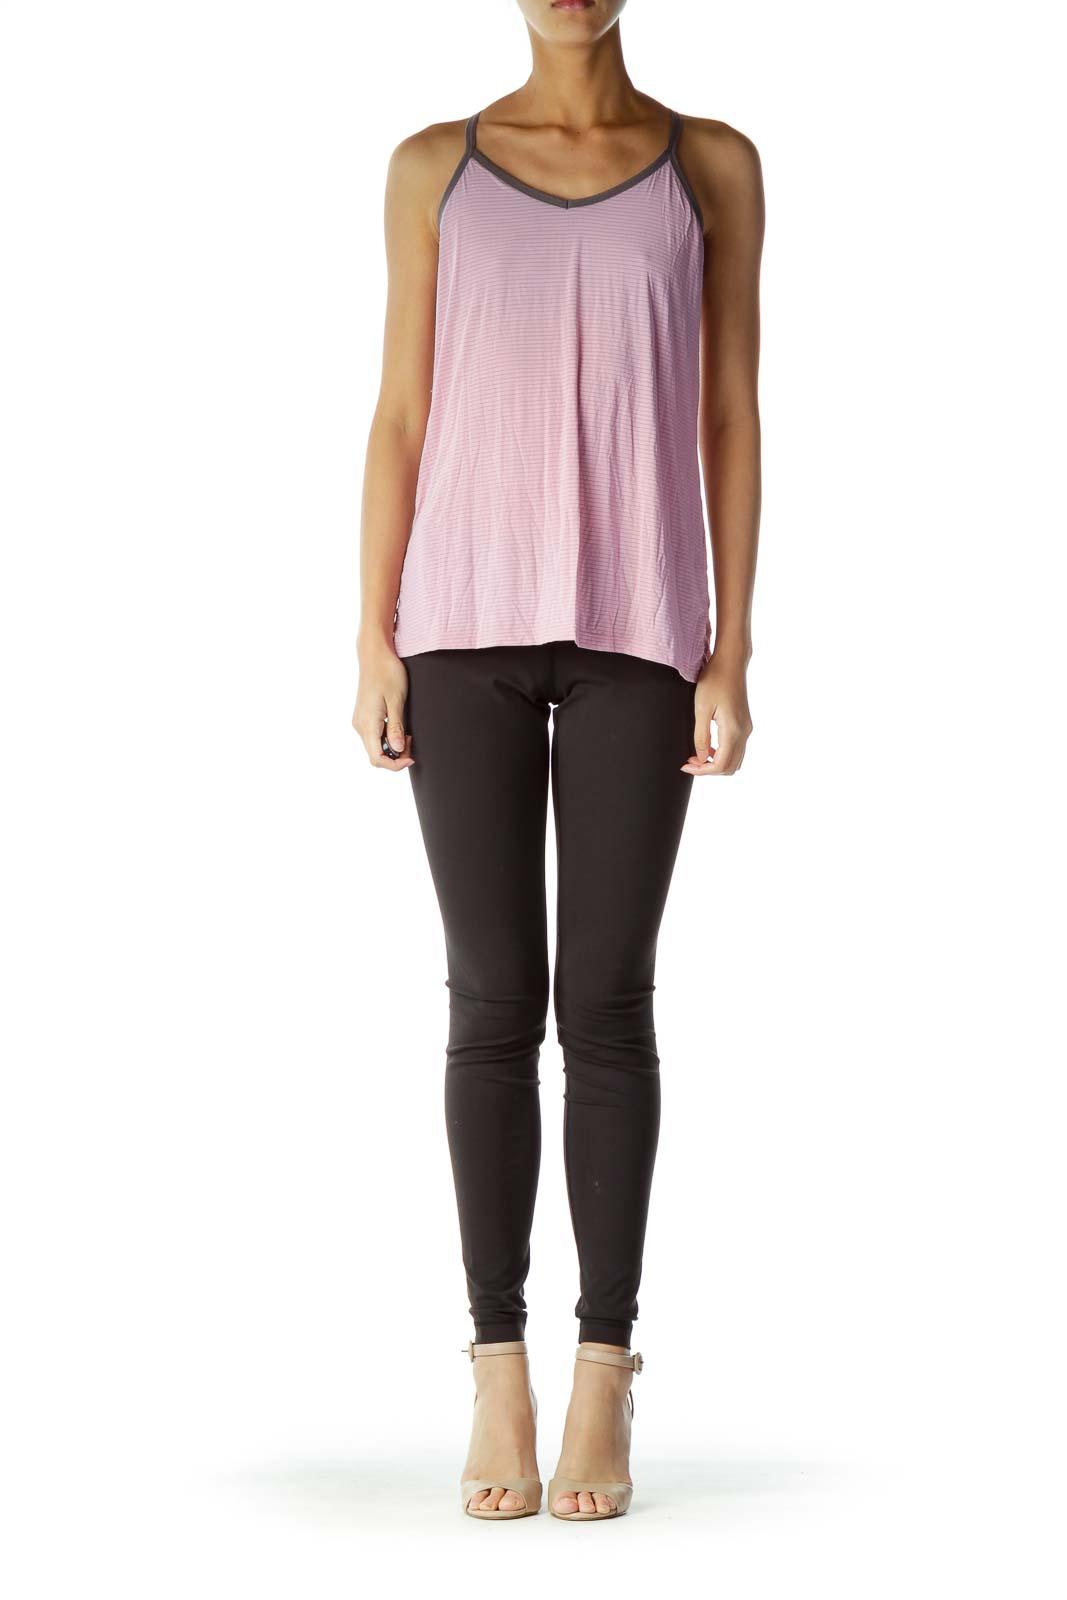 Pink Gray Loose Striped Yoga Top